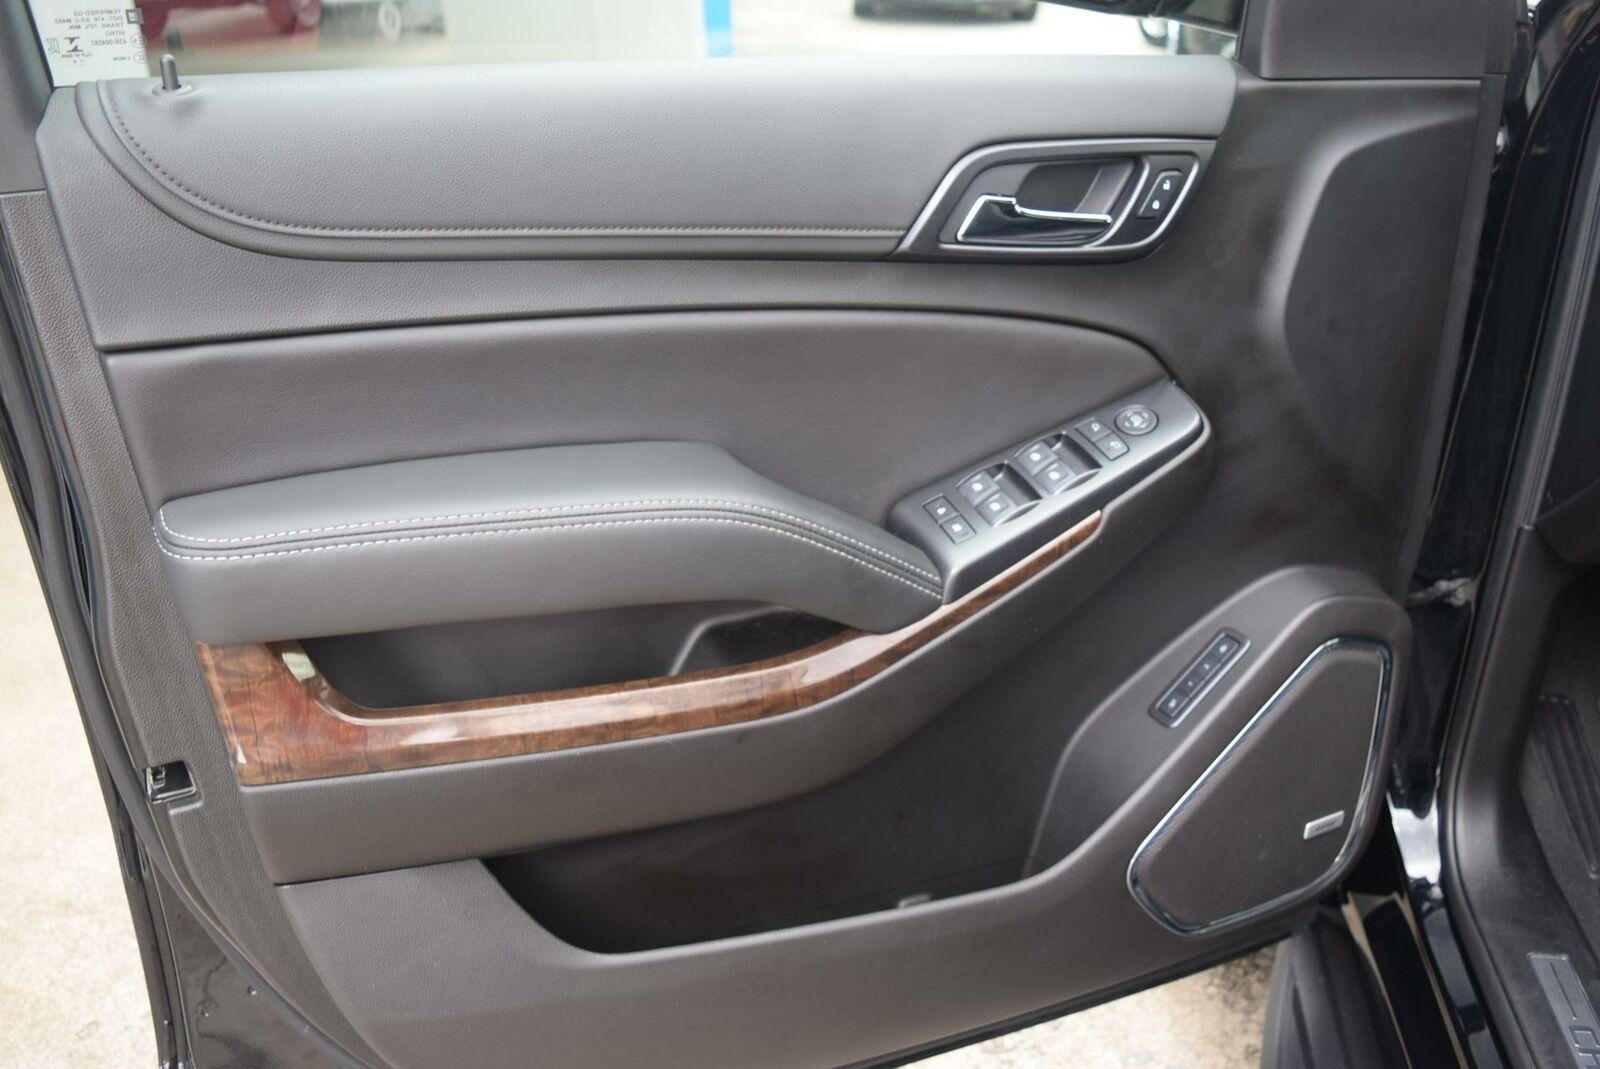 Chevrolet Suburban 2019 photo 4